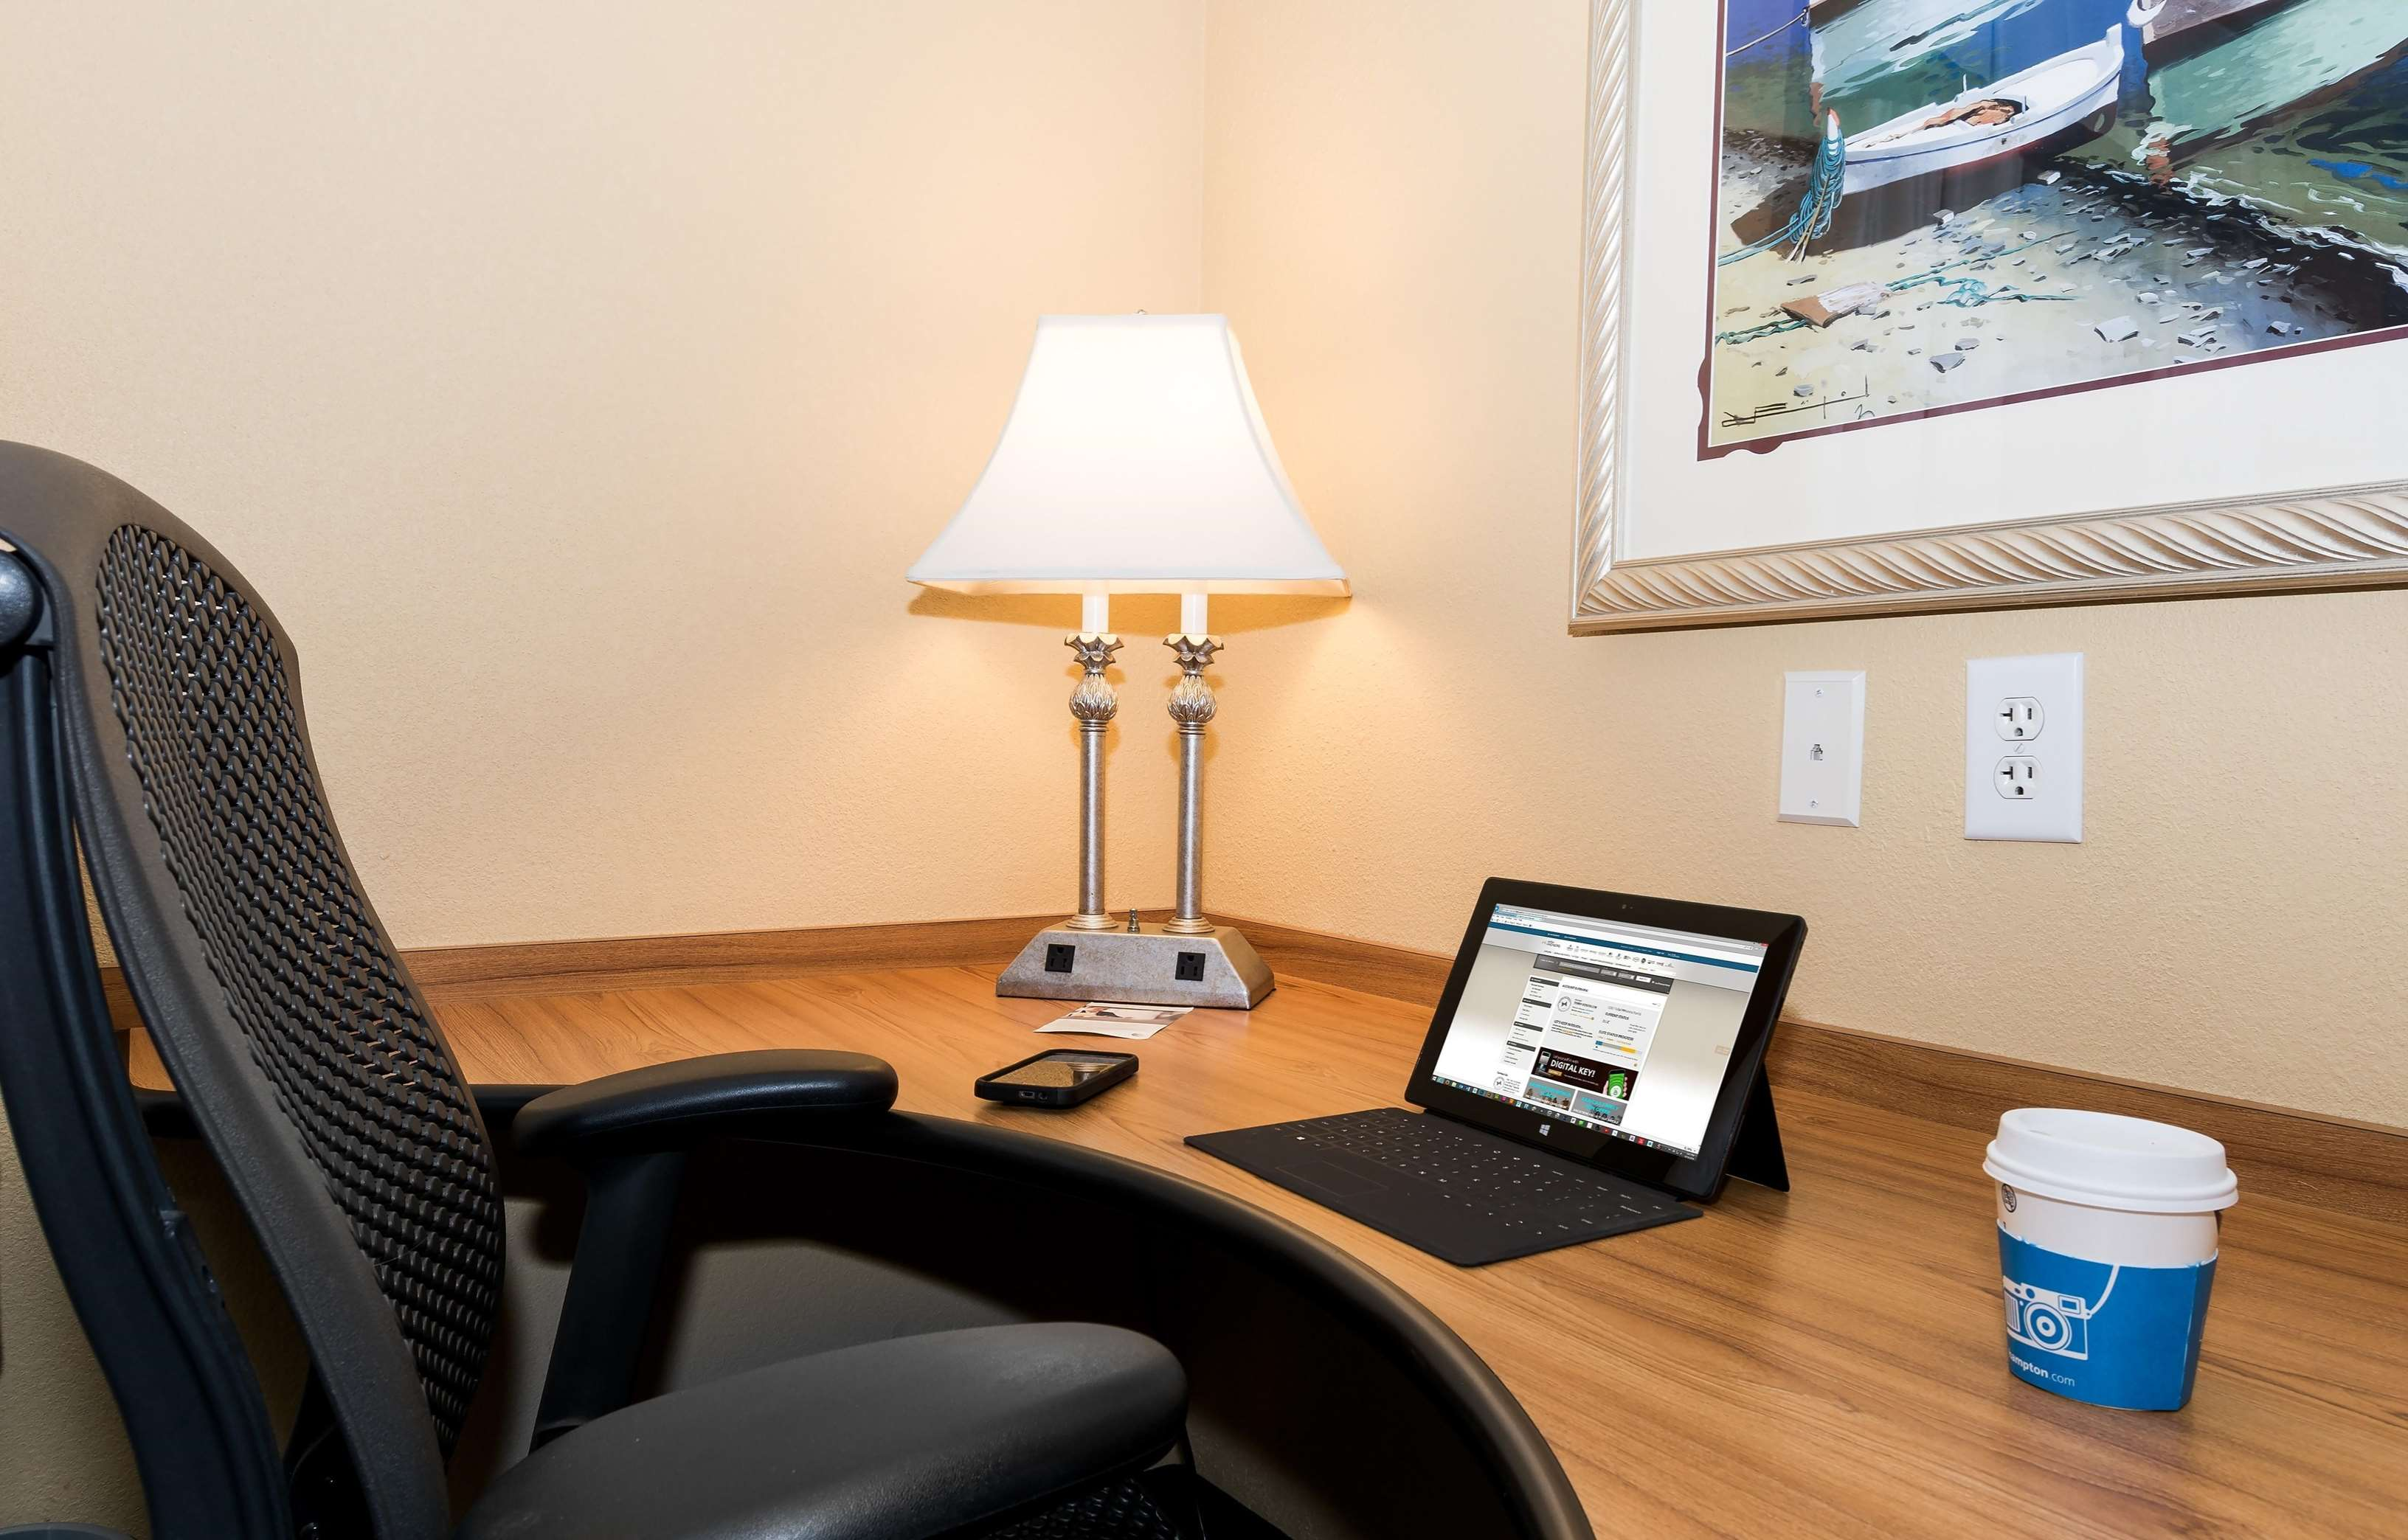 Hampton Inn & Suites Jacksonville South-St. Johns Town Center Area image 25